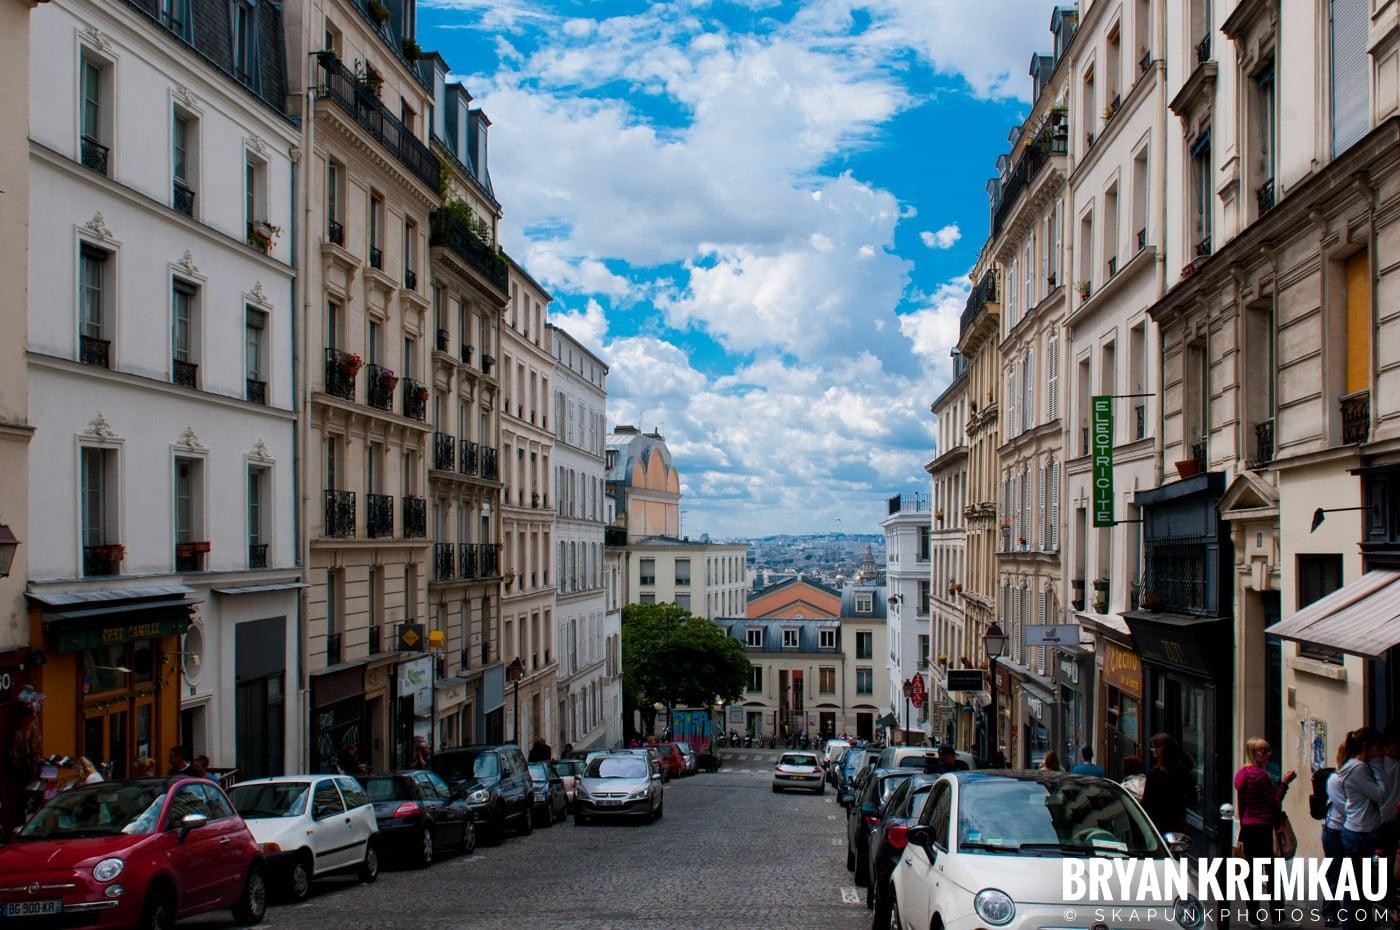 Paris, France Honeymoon - Day 6 - 7.23.11 (19)